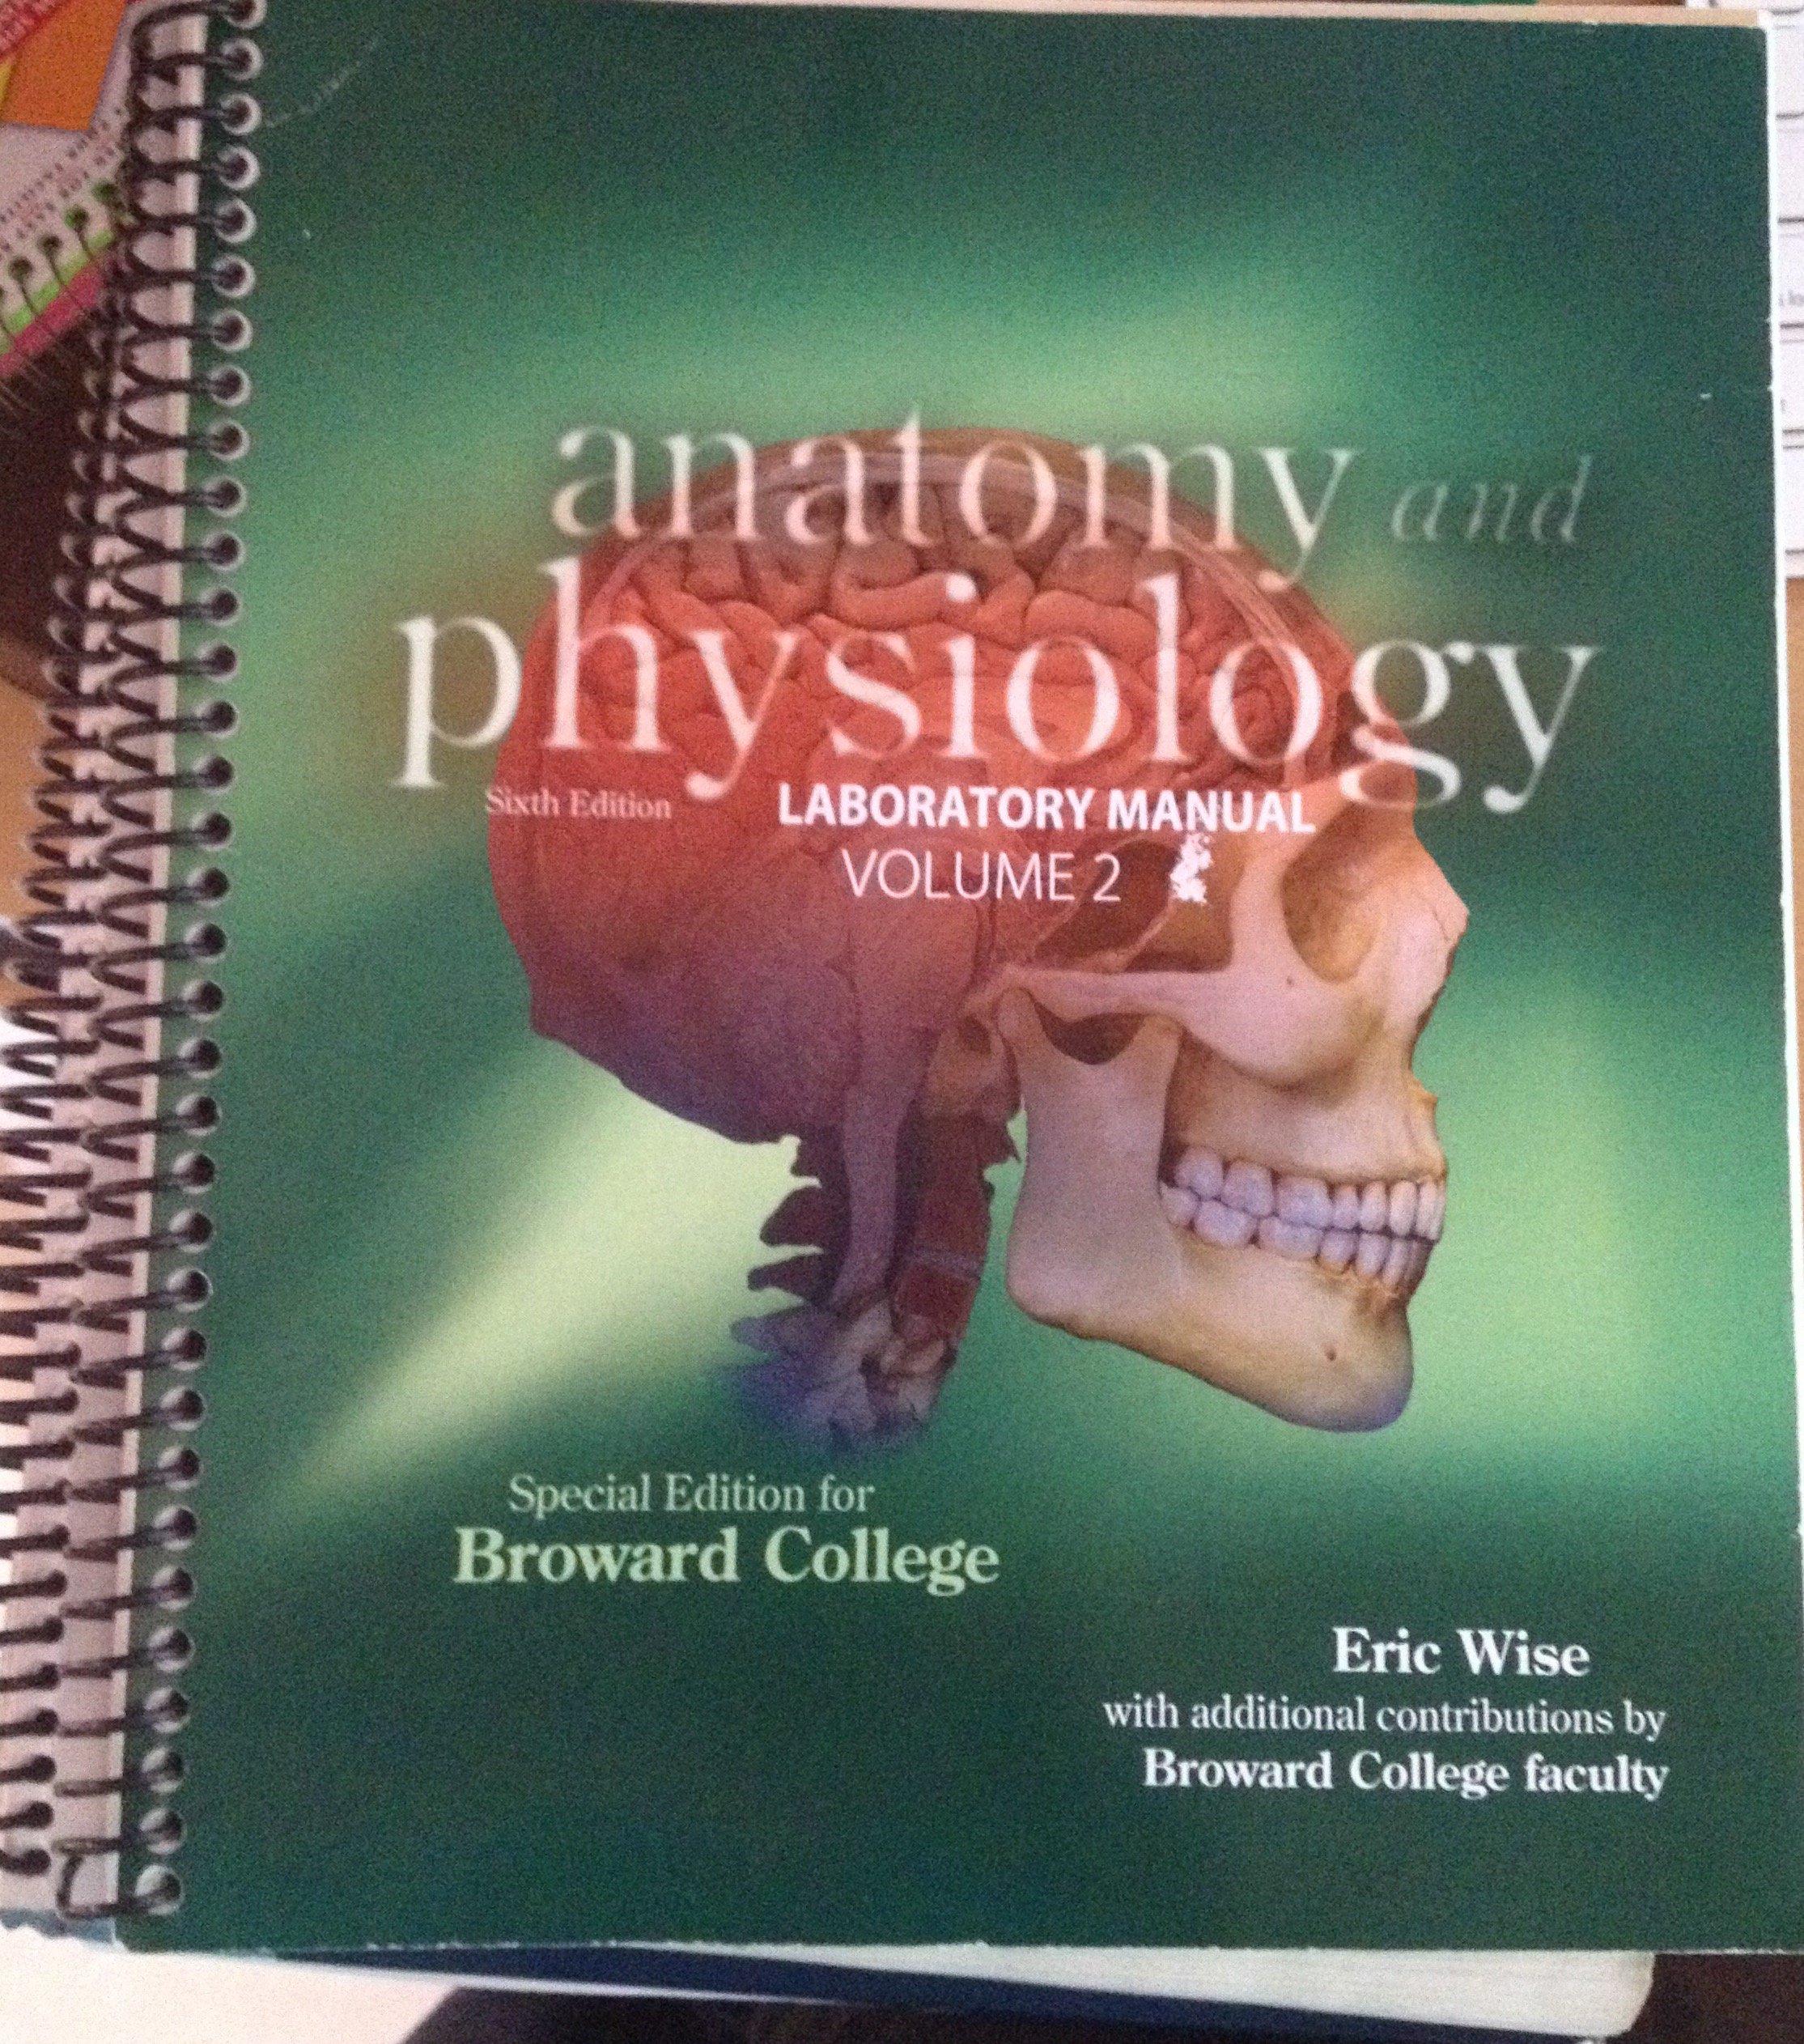 Anatomy and Physiology Lab Manual Volume 2: Amazon.com: Books